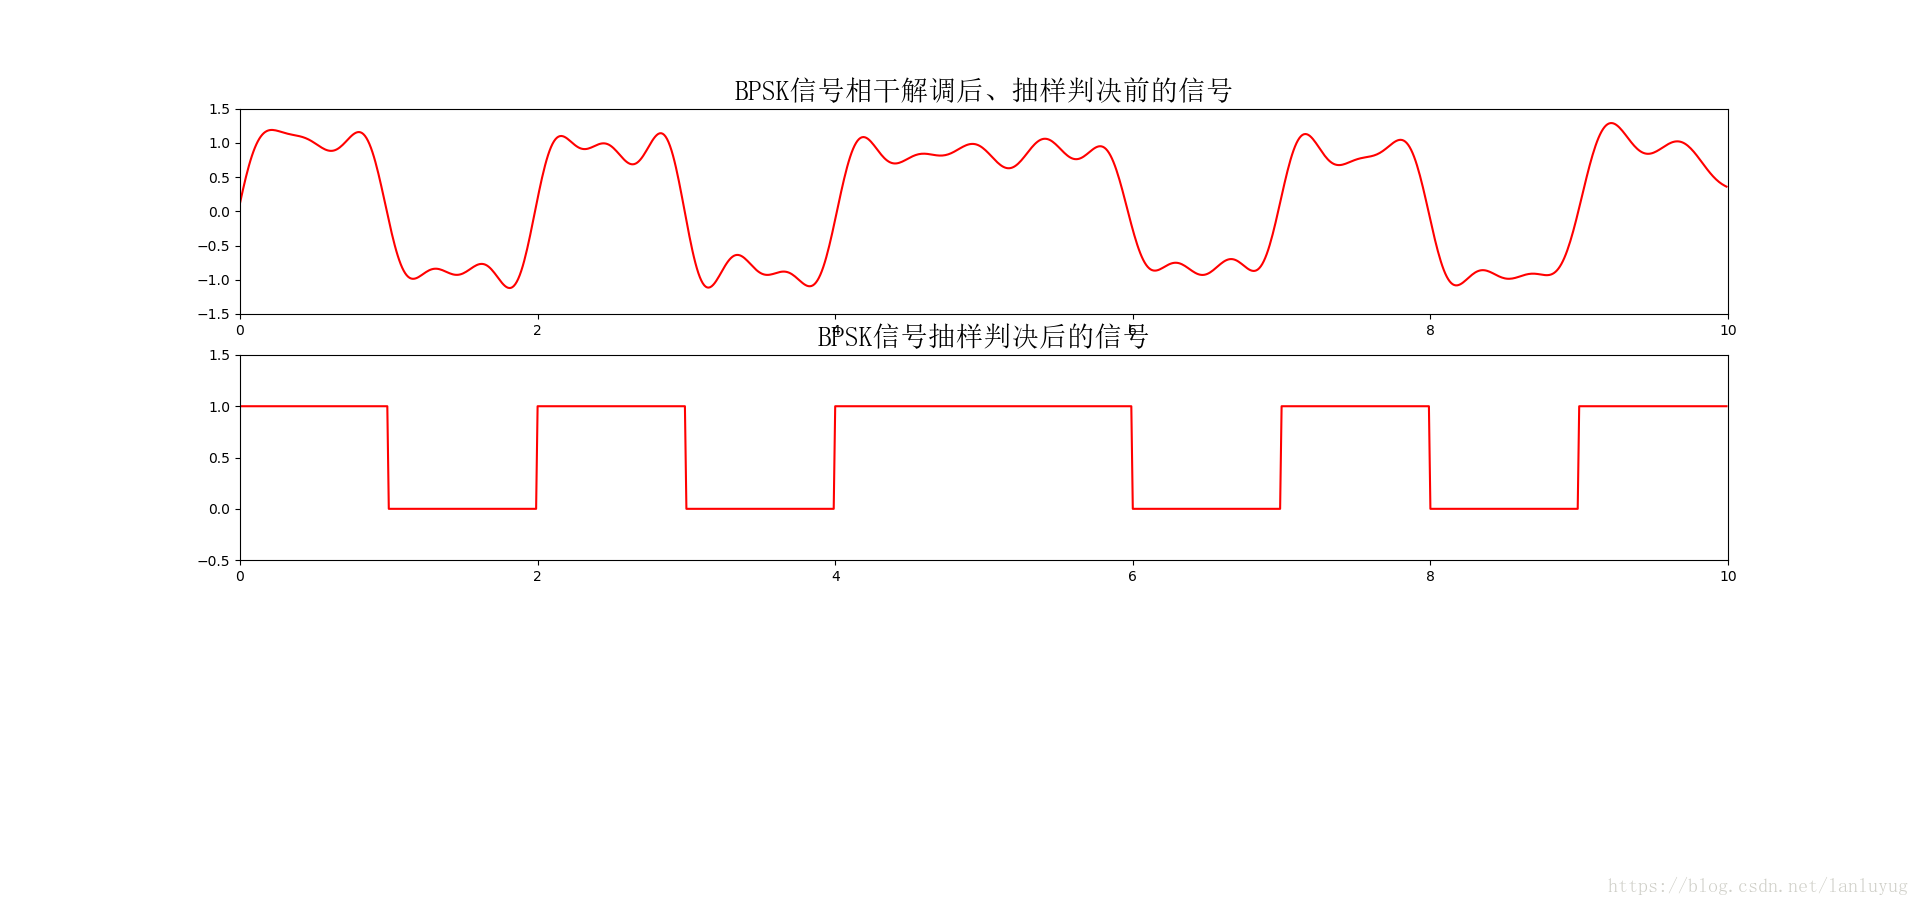 Python realizes BPSK modulation signal demodulation